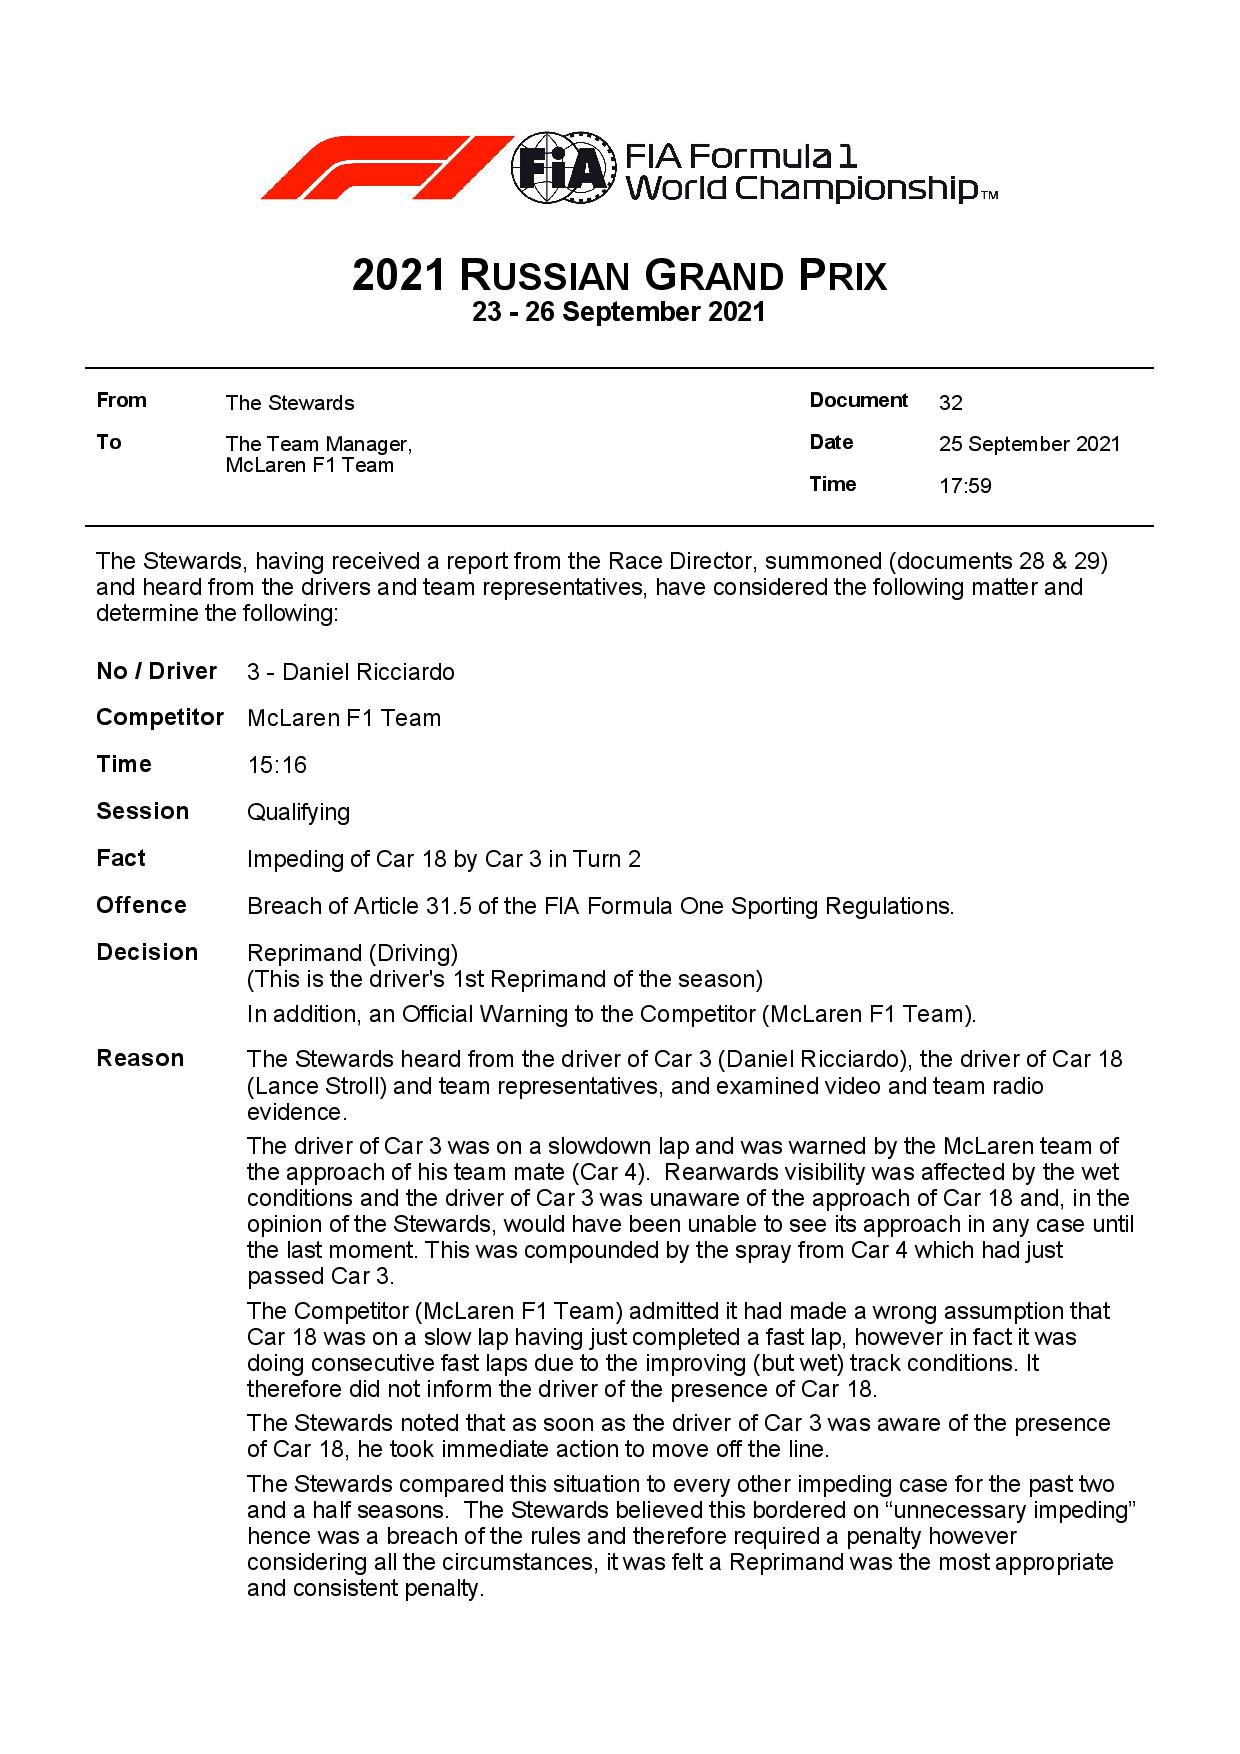 Official: Ricciardo will get a reprimand, McLaren a warning    F1only.fr